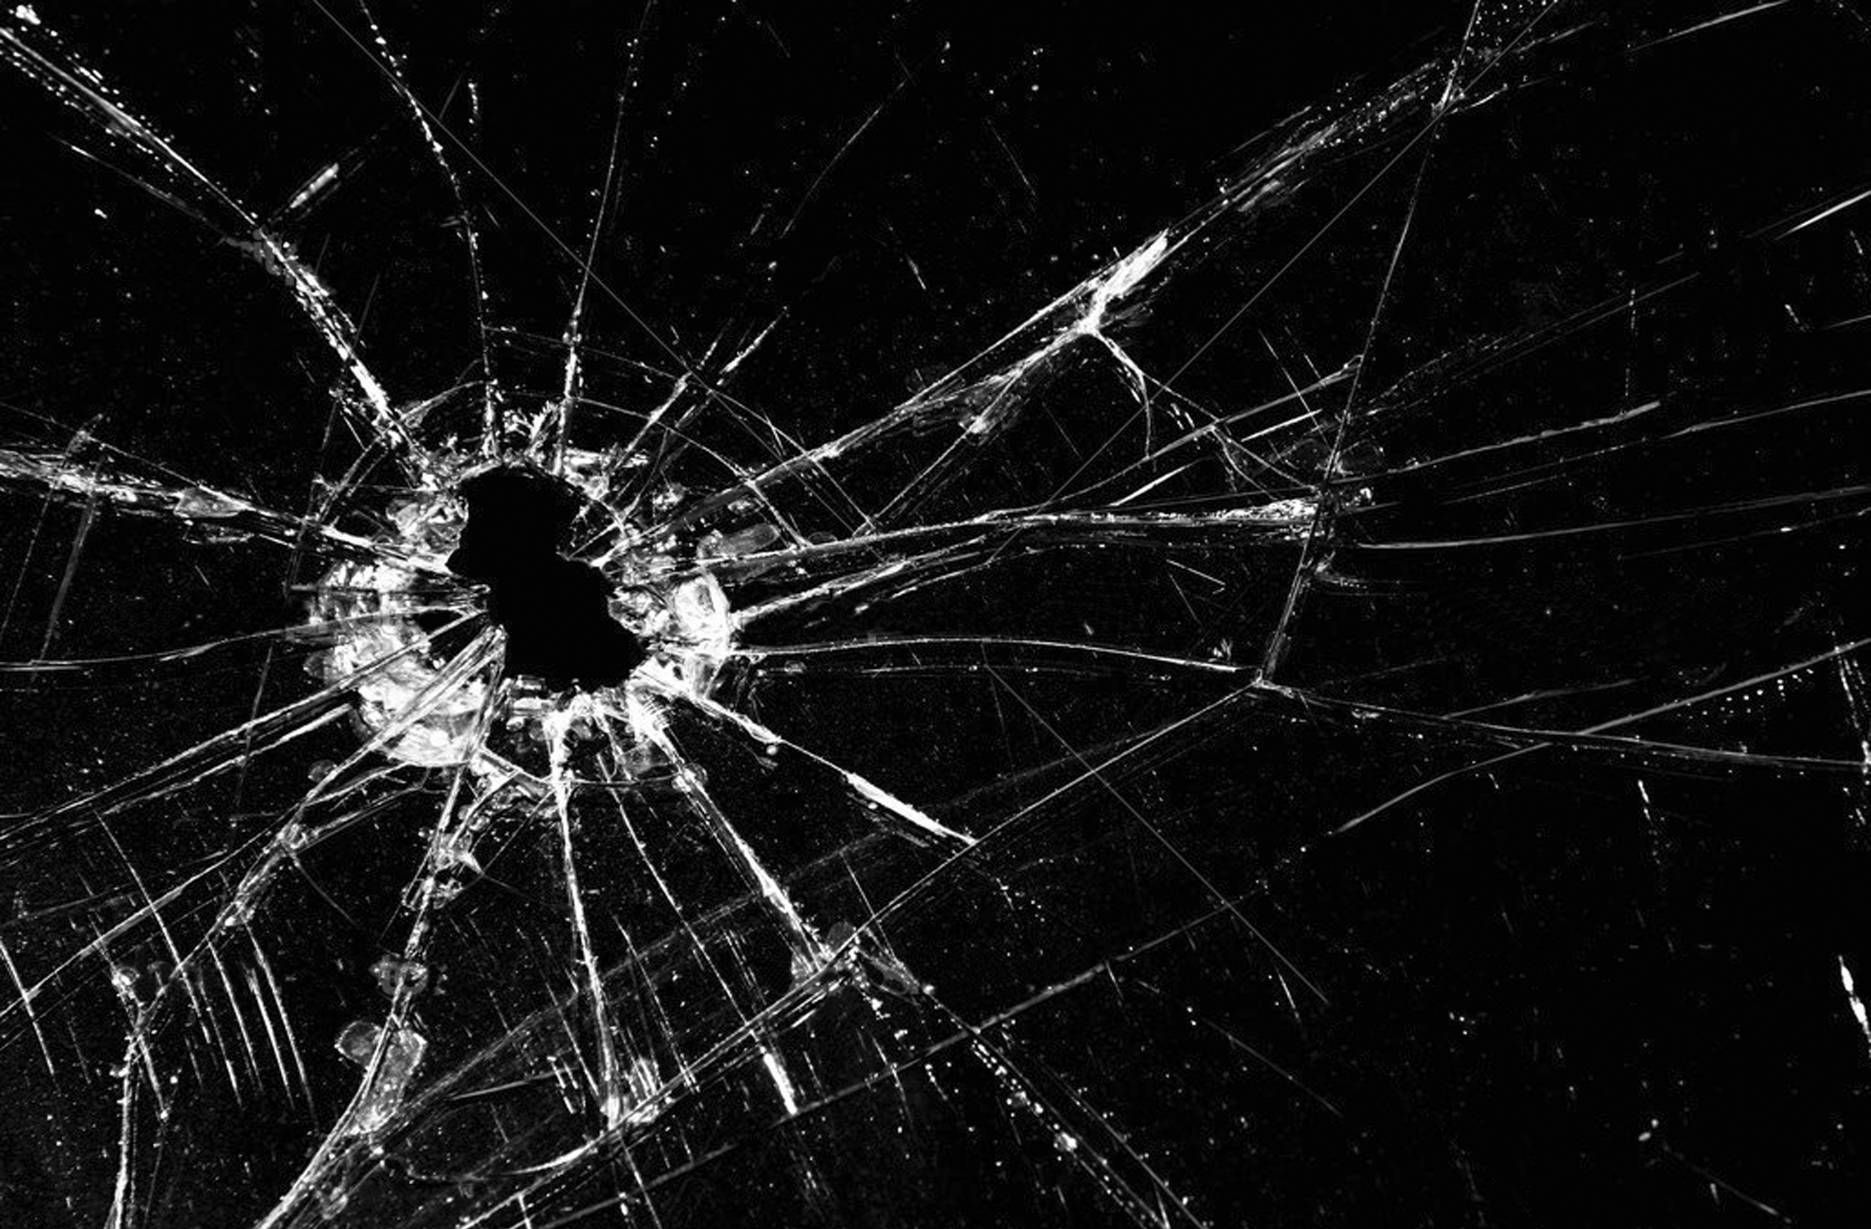 Broken Glass Backgrounds Broken Glass Wallpaper Broken Glass Broken Screen Wallpaper